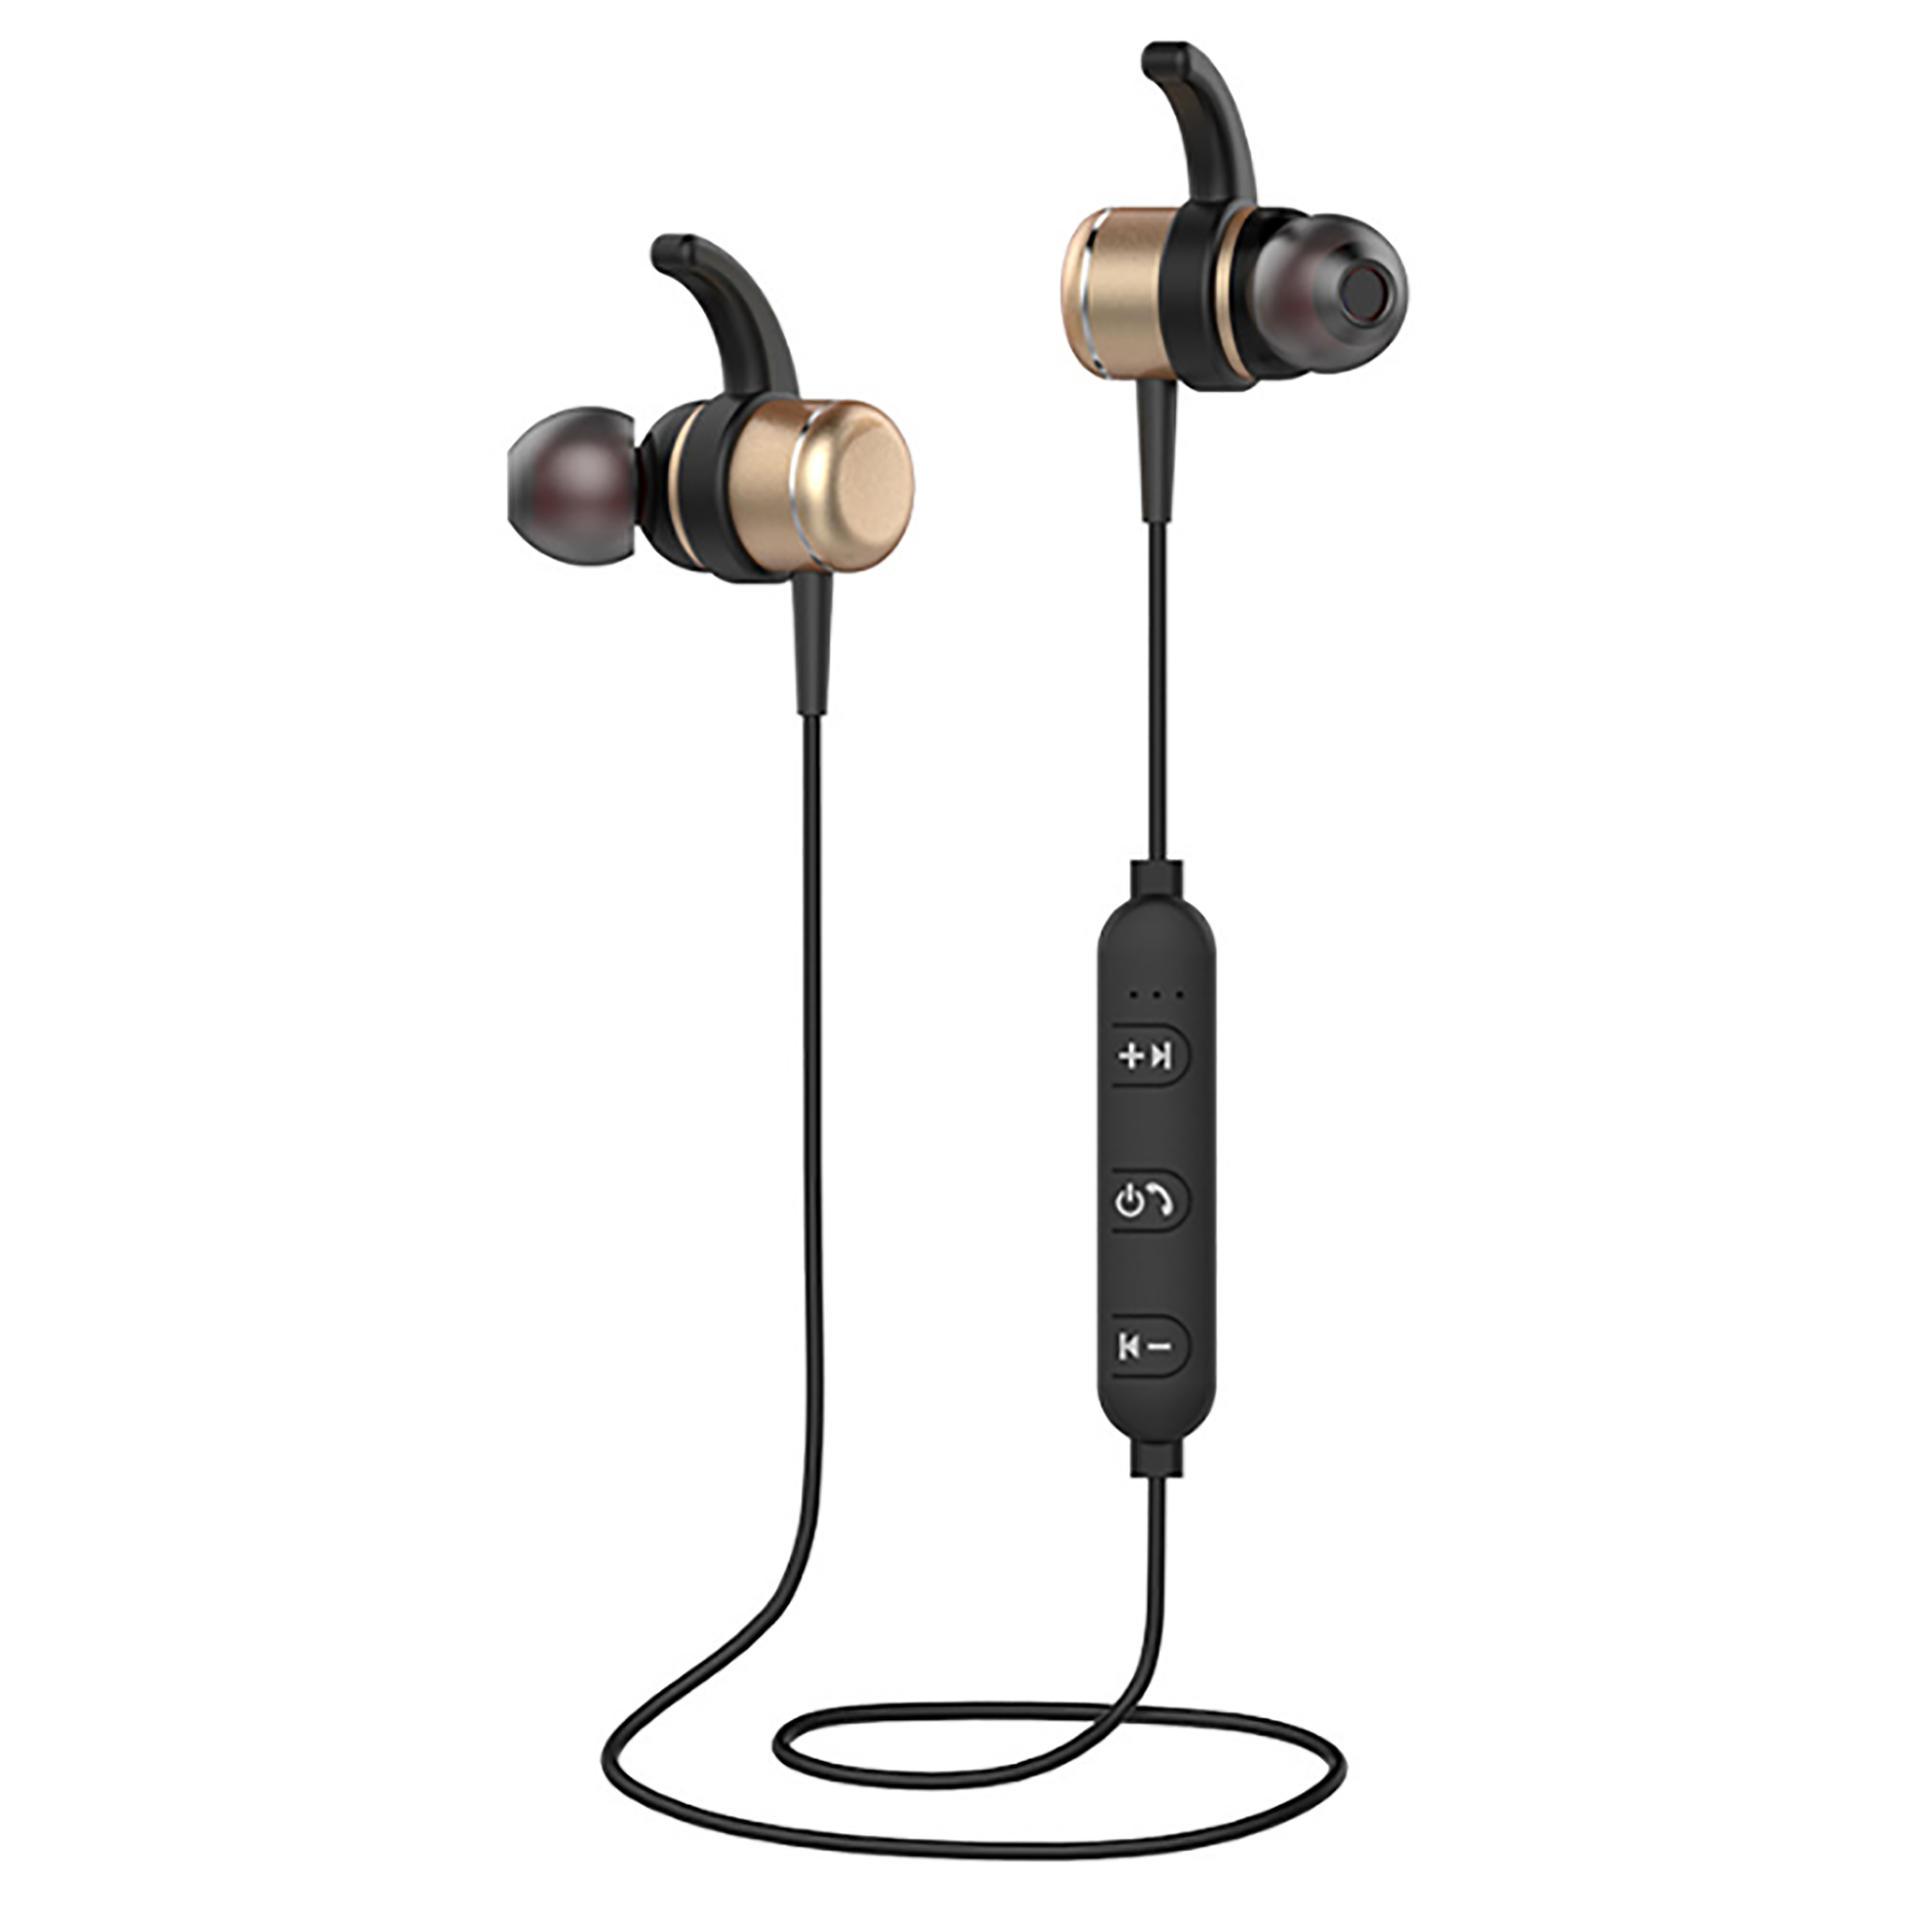 Sport Bluetooth Earphone with New Design V5.0 bluetooth in-ear headphone